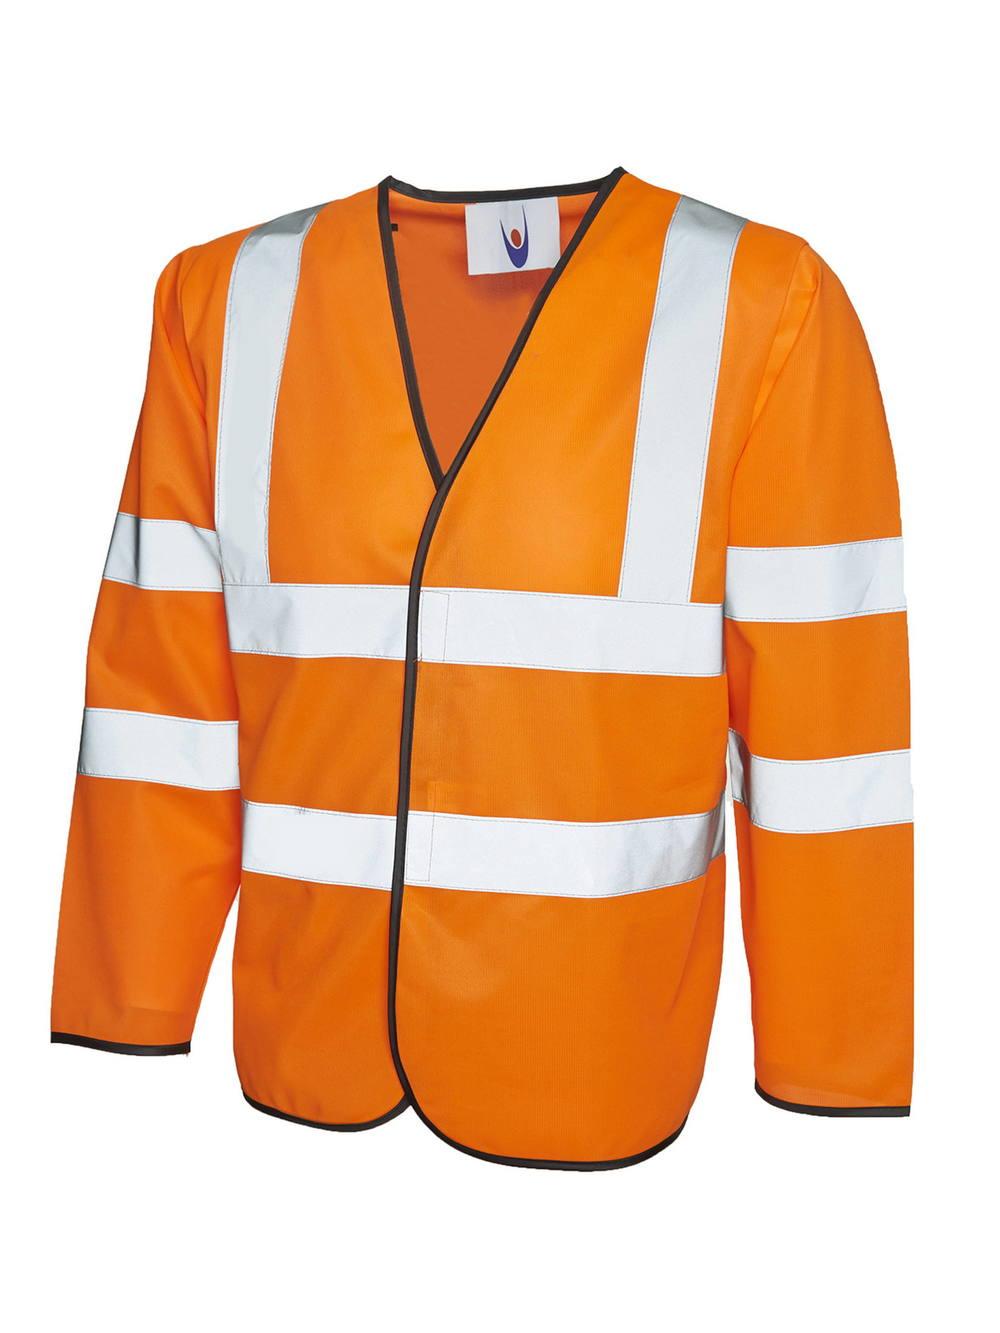 Uneek Long Sleeve Safety Waist Coat